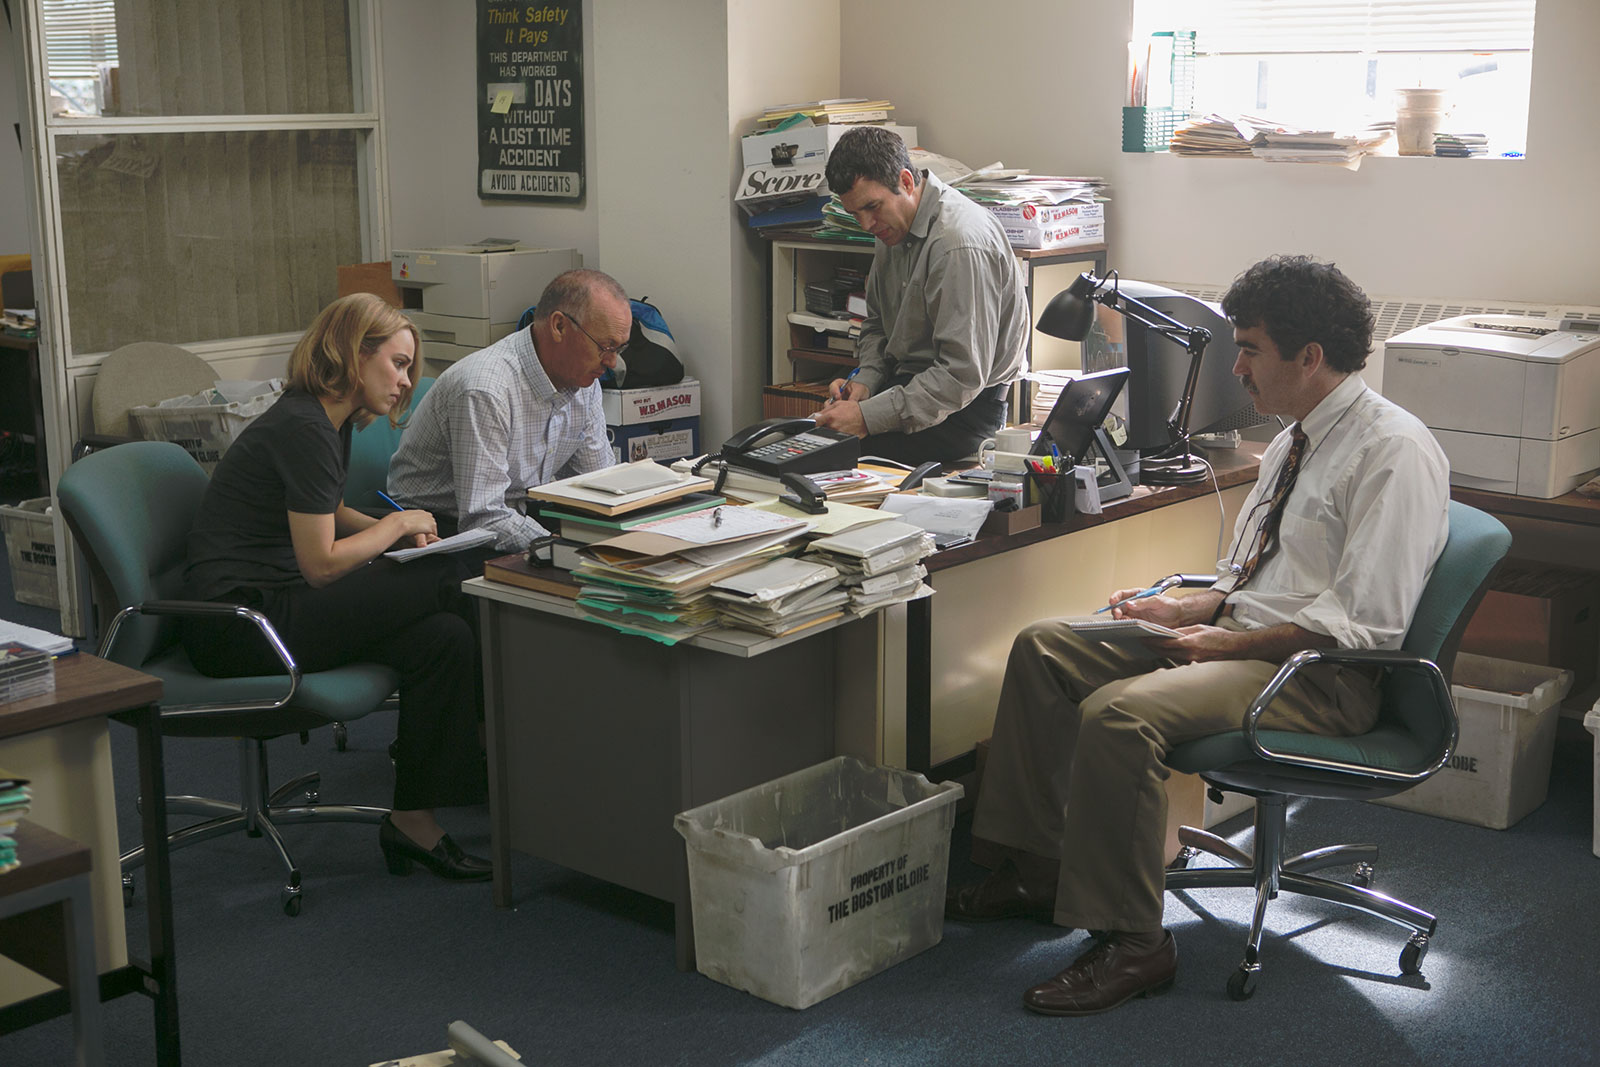 Spotlight - Rachel McAdams, Brian d'Arcy James, Mark Ruffalo, Michael Keaton,